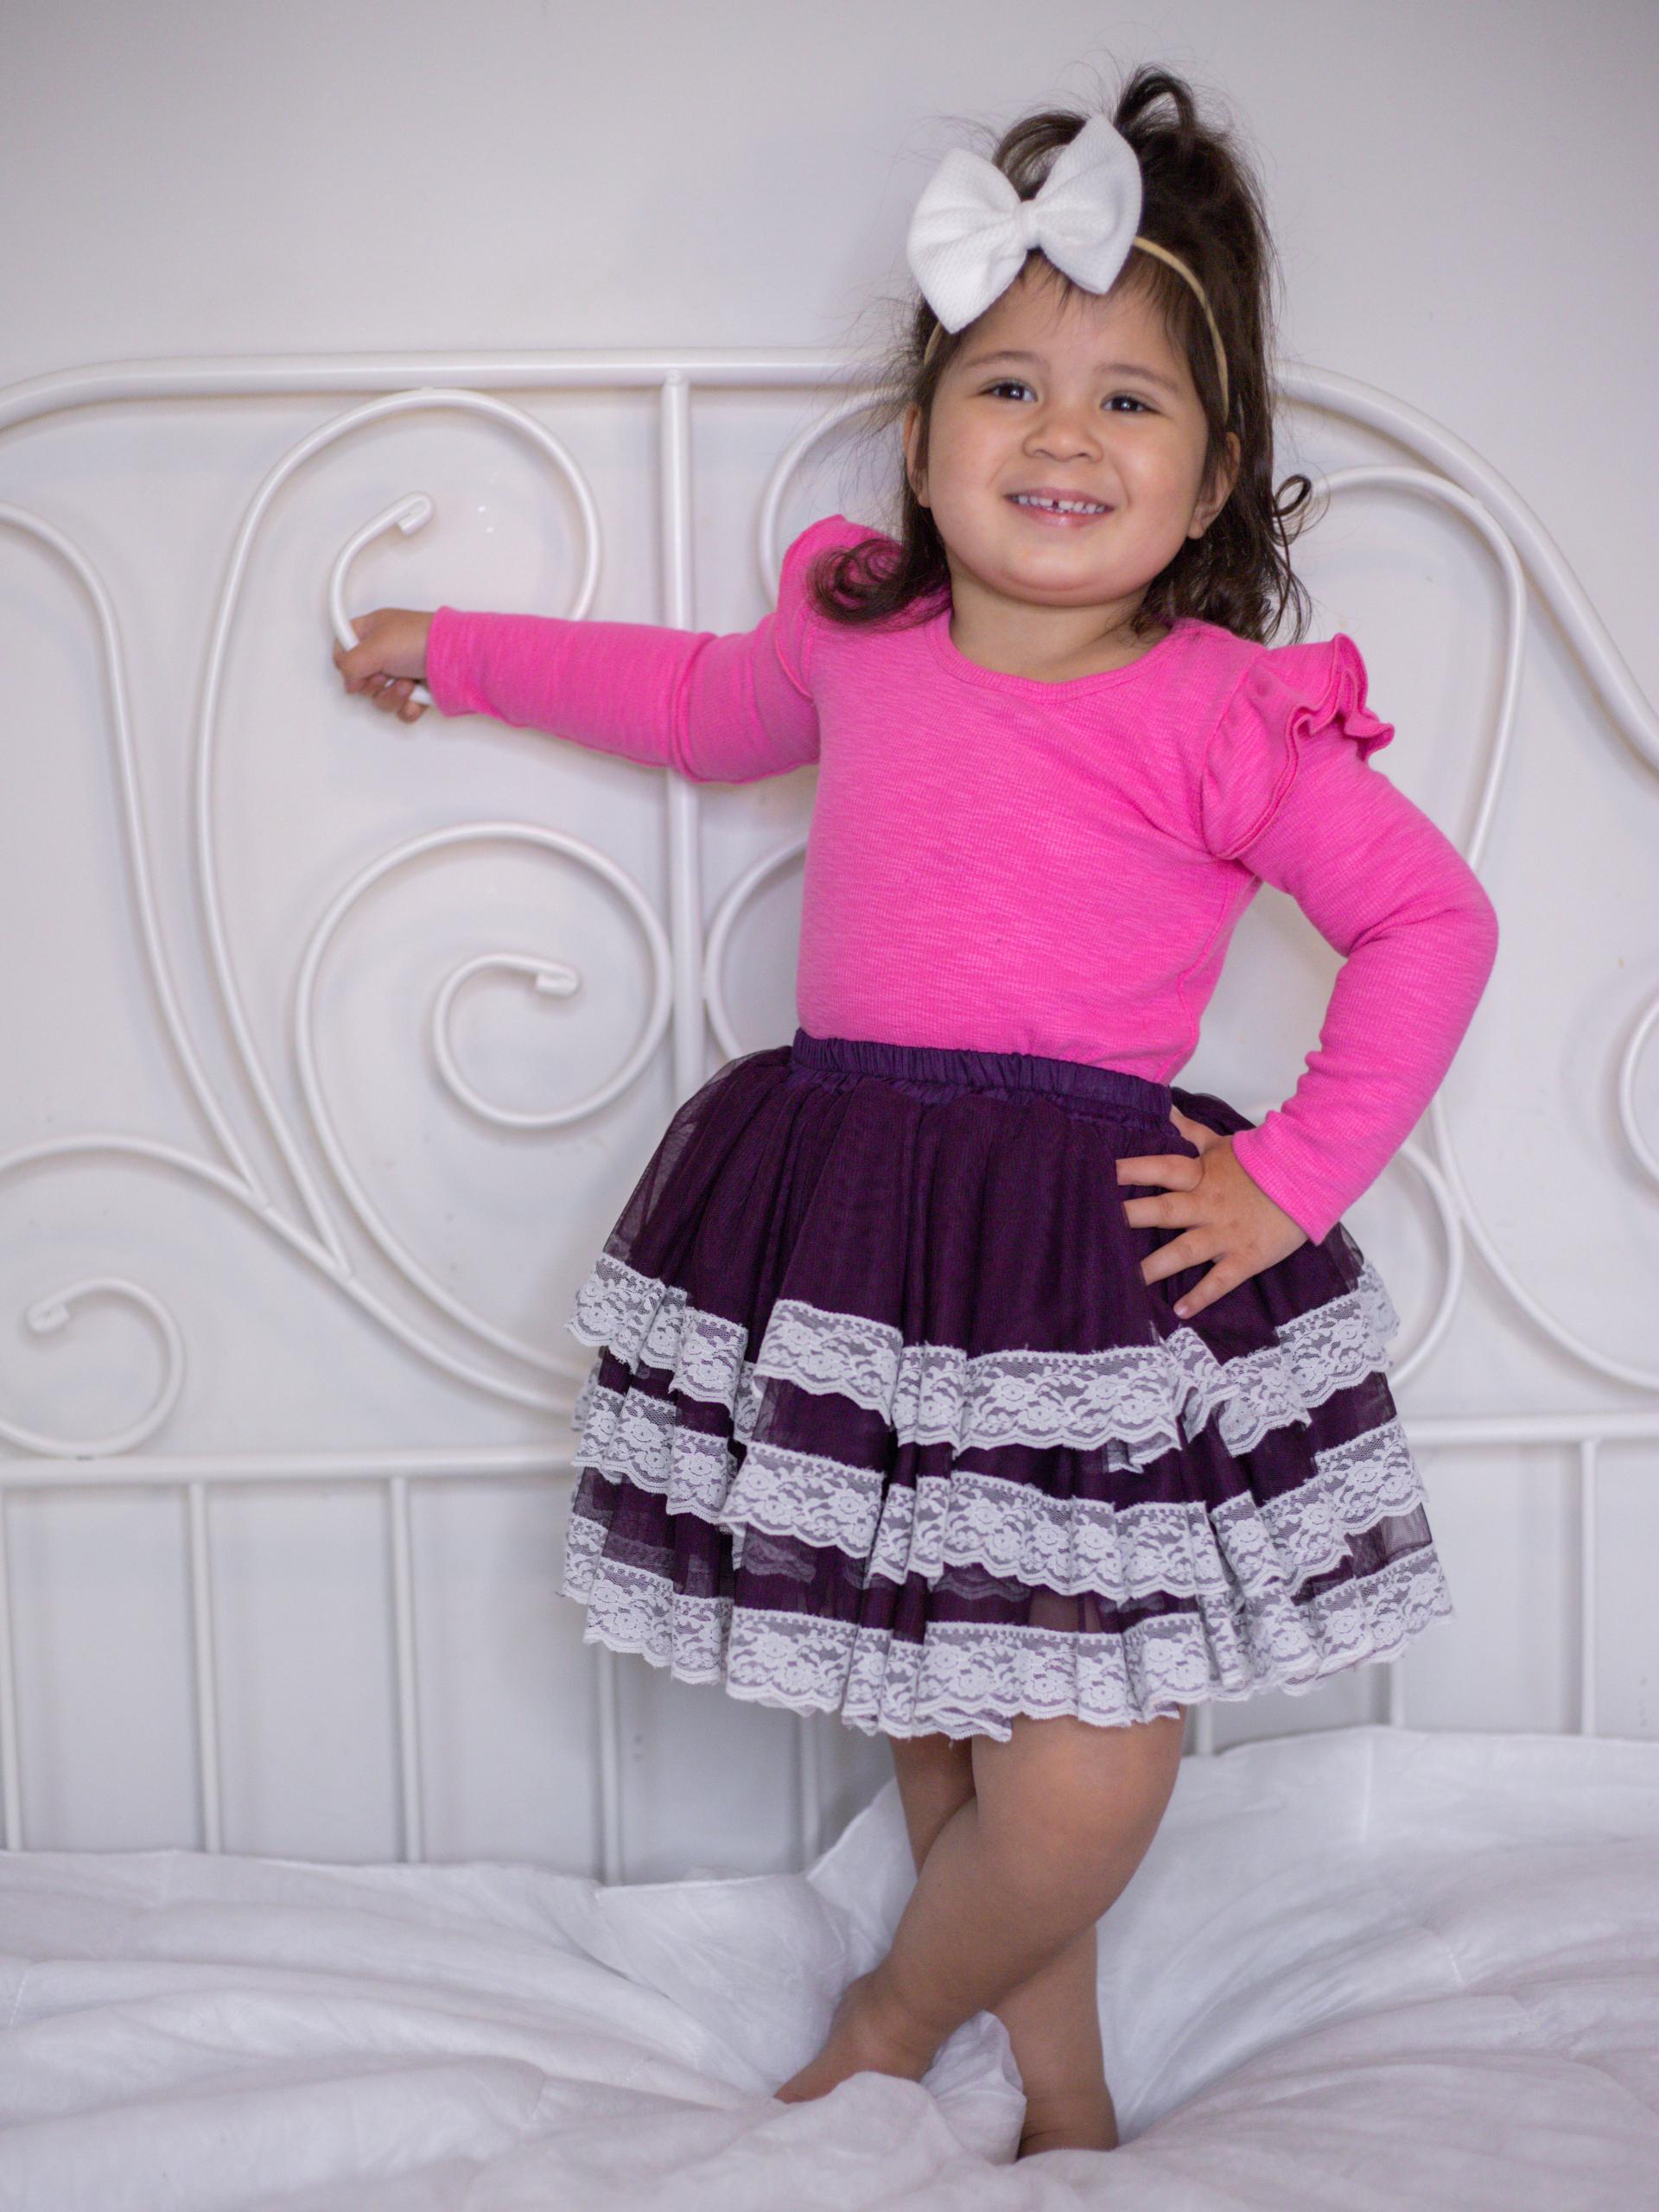 Cute girl in cute outfit